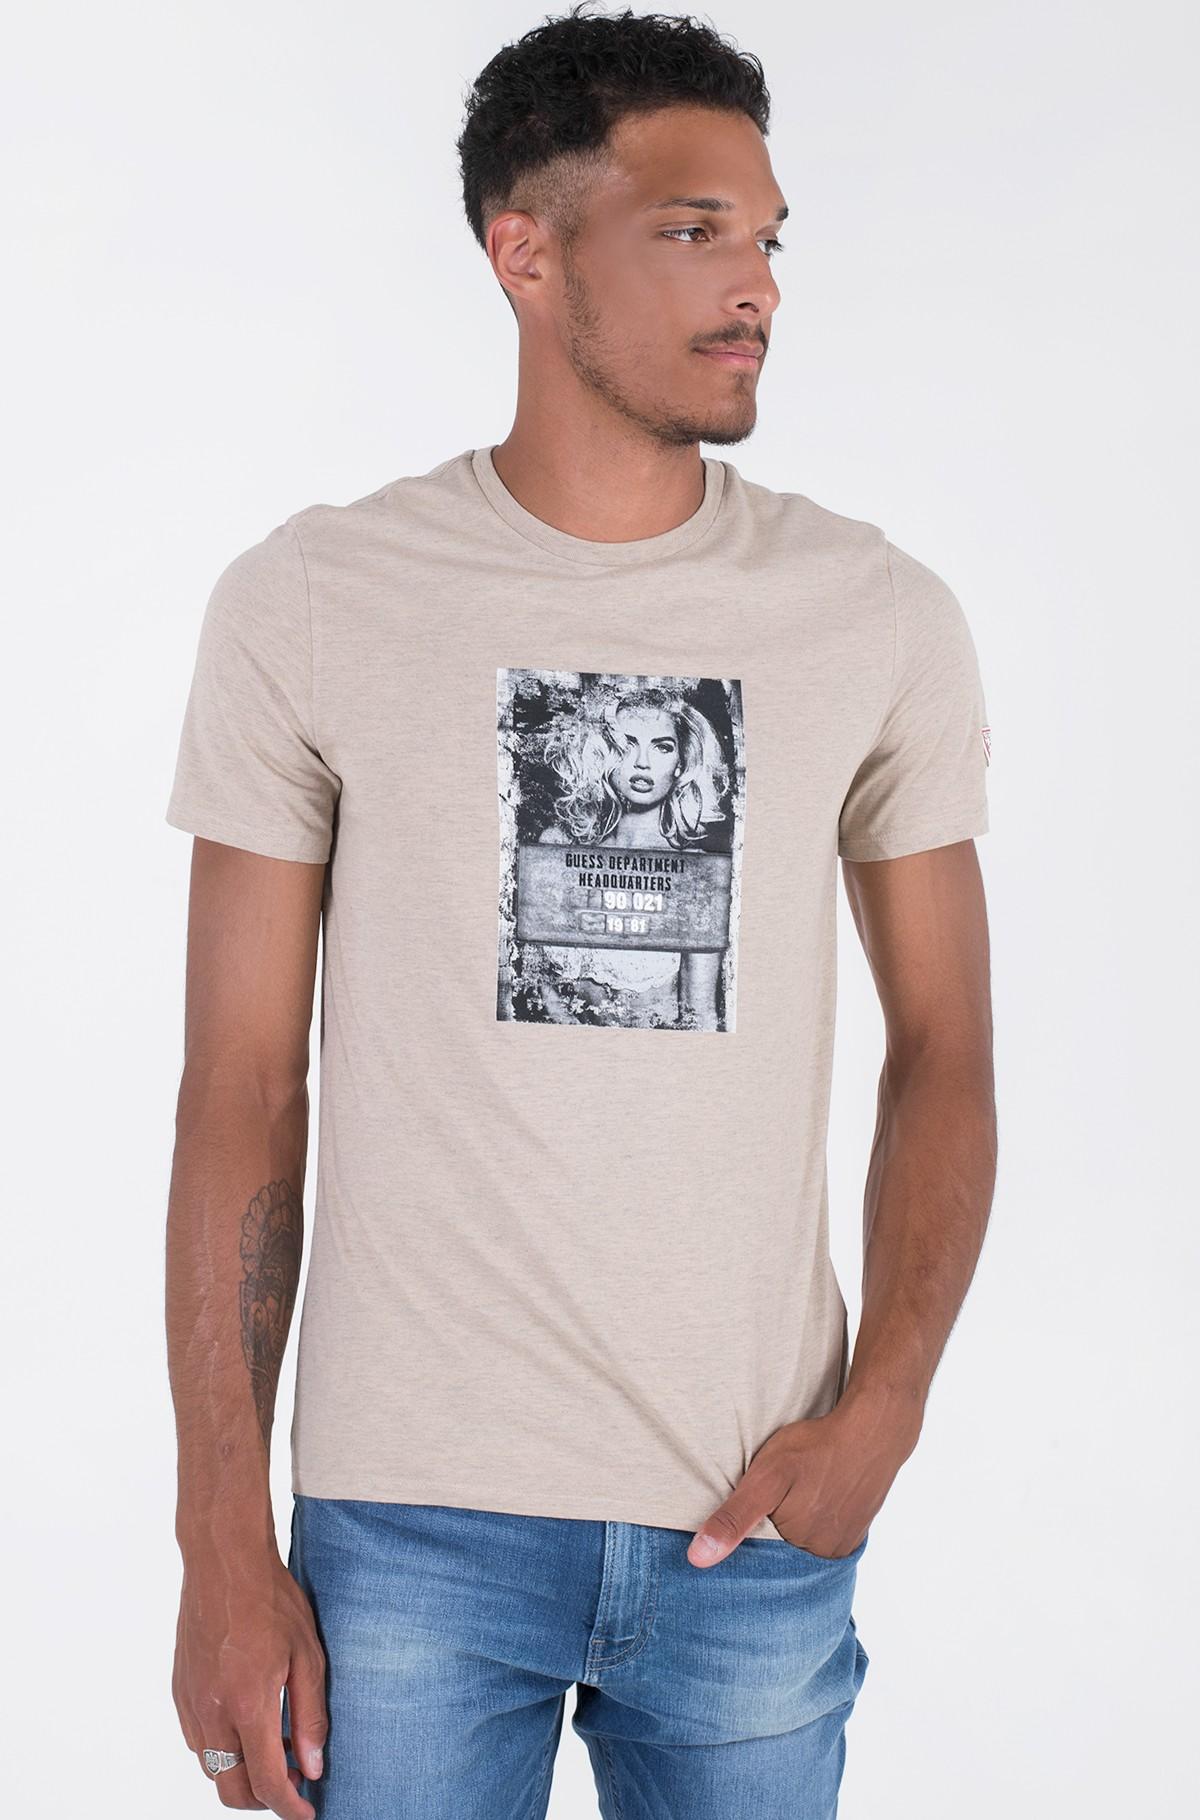 T-shirt M1YI84 I3Z11-full-1